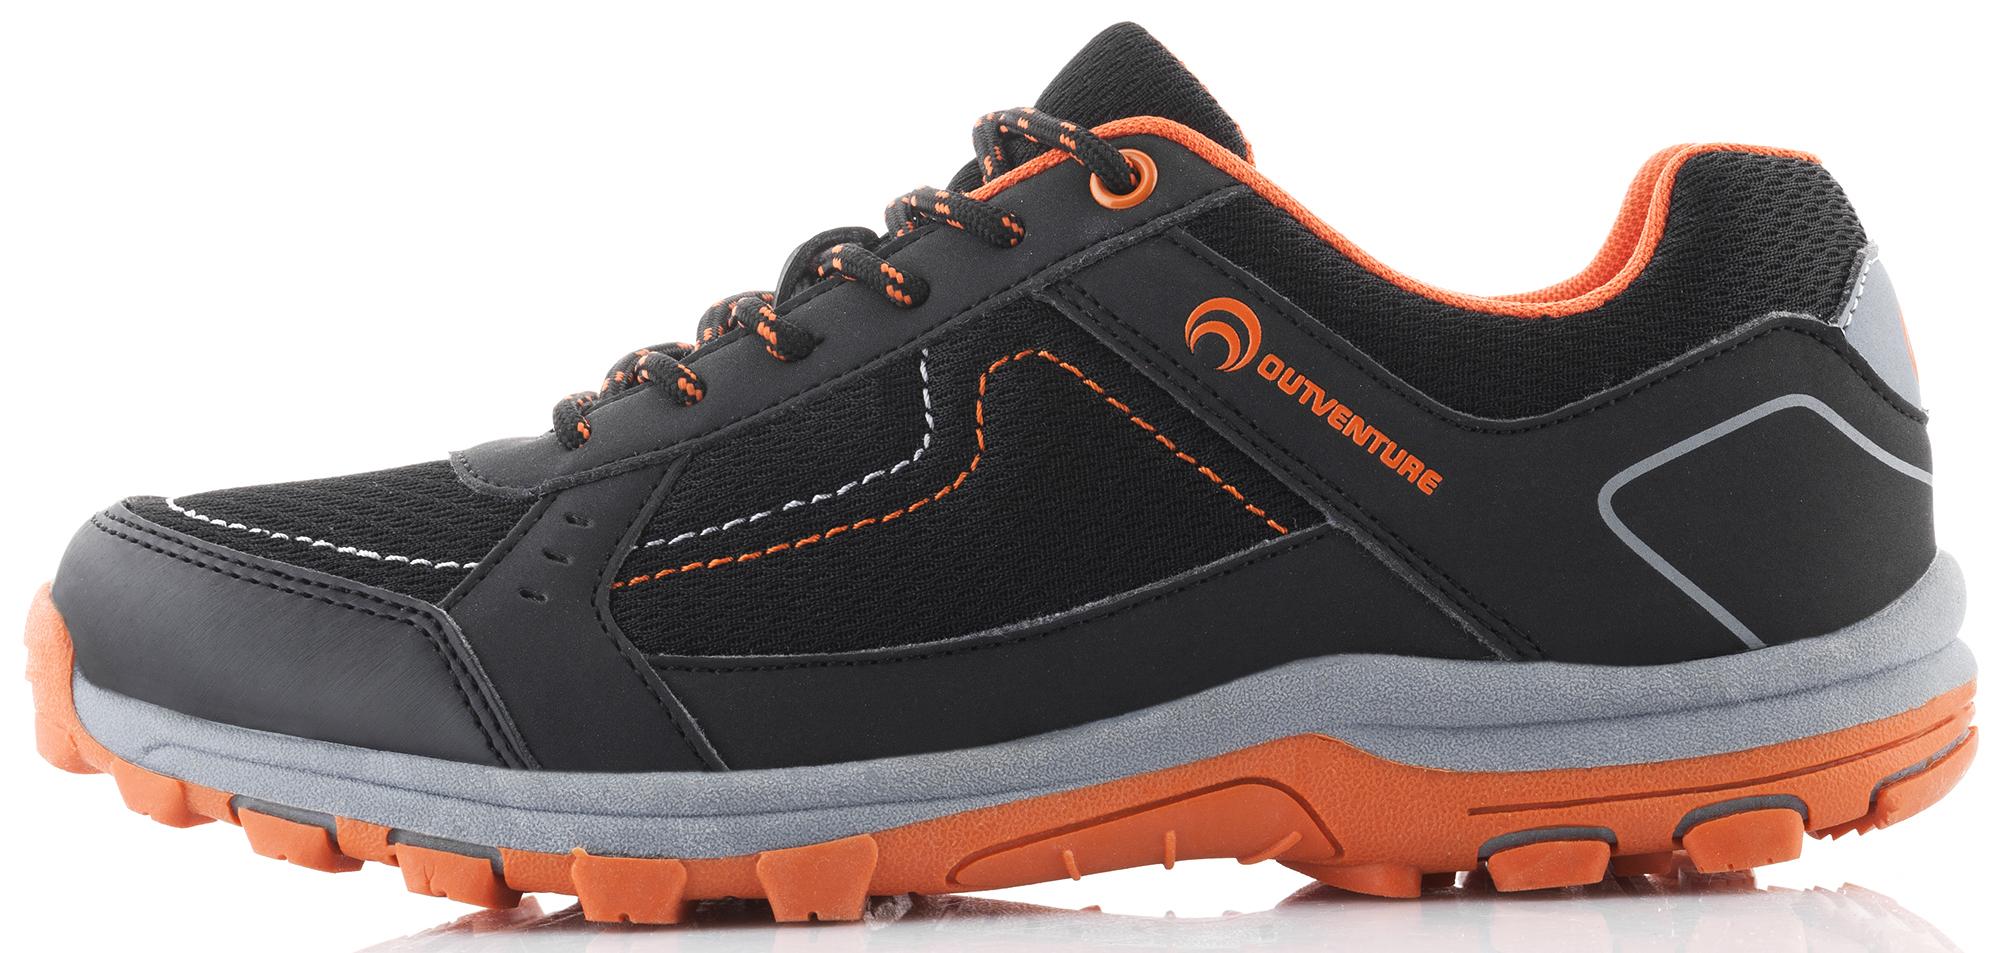 Outventure Полуботинки для мальчиков Outventure Track outventure ботинки для мальчиков outventure track mid